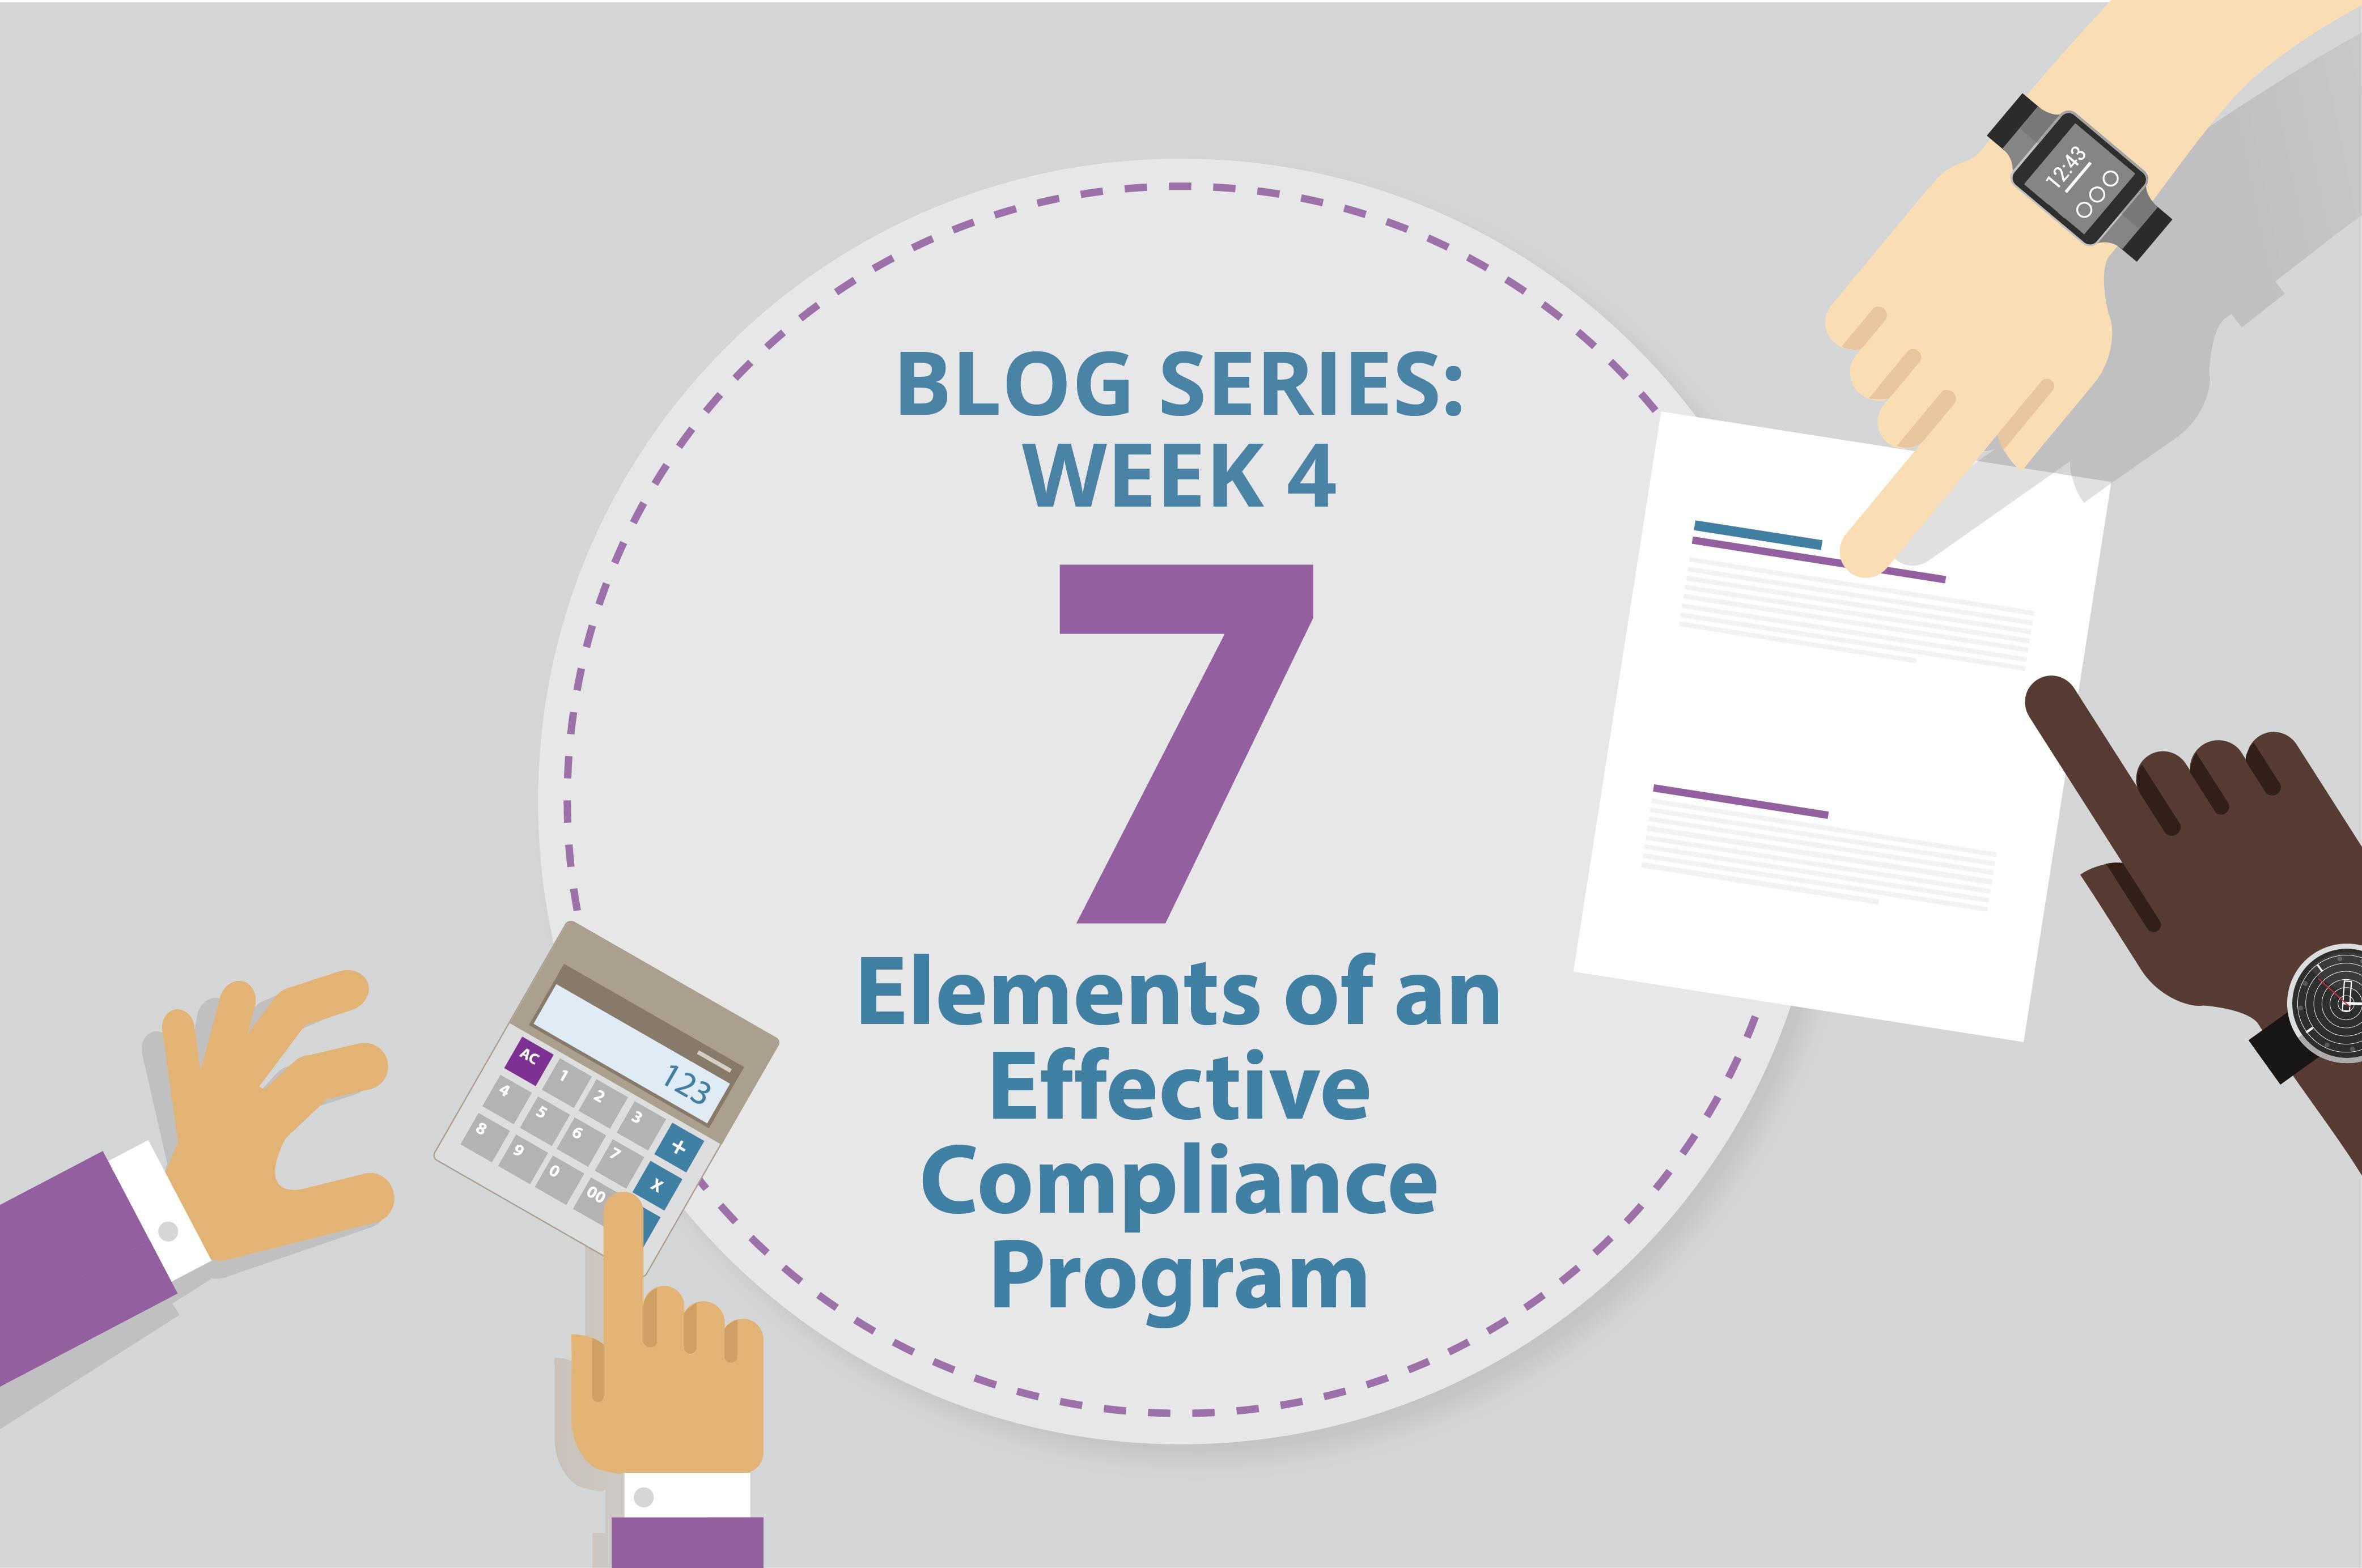 [Blog Series] 7 Elements of an Effective Compliance Program: Week 4